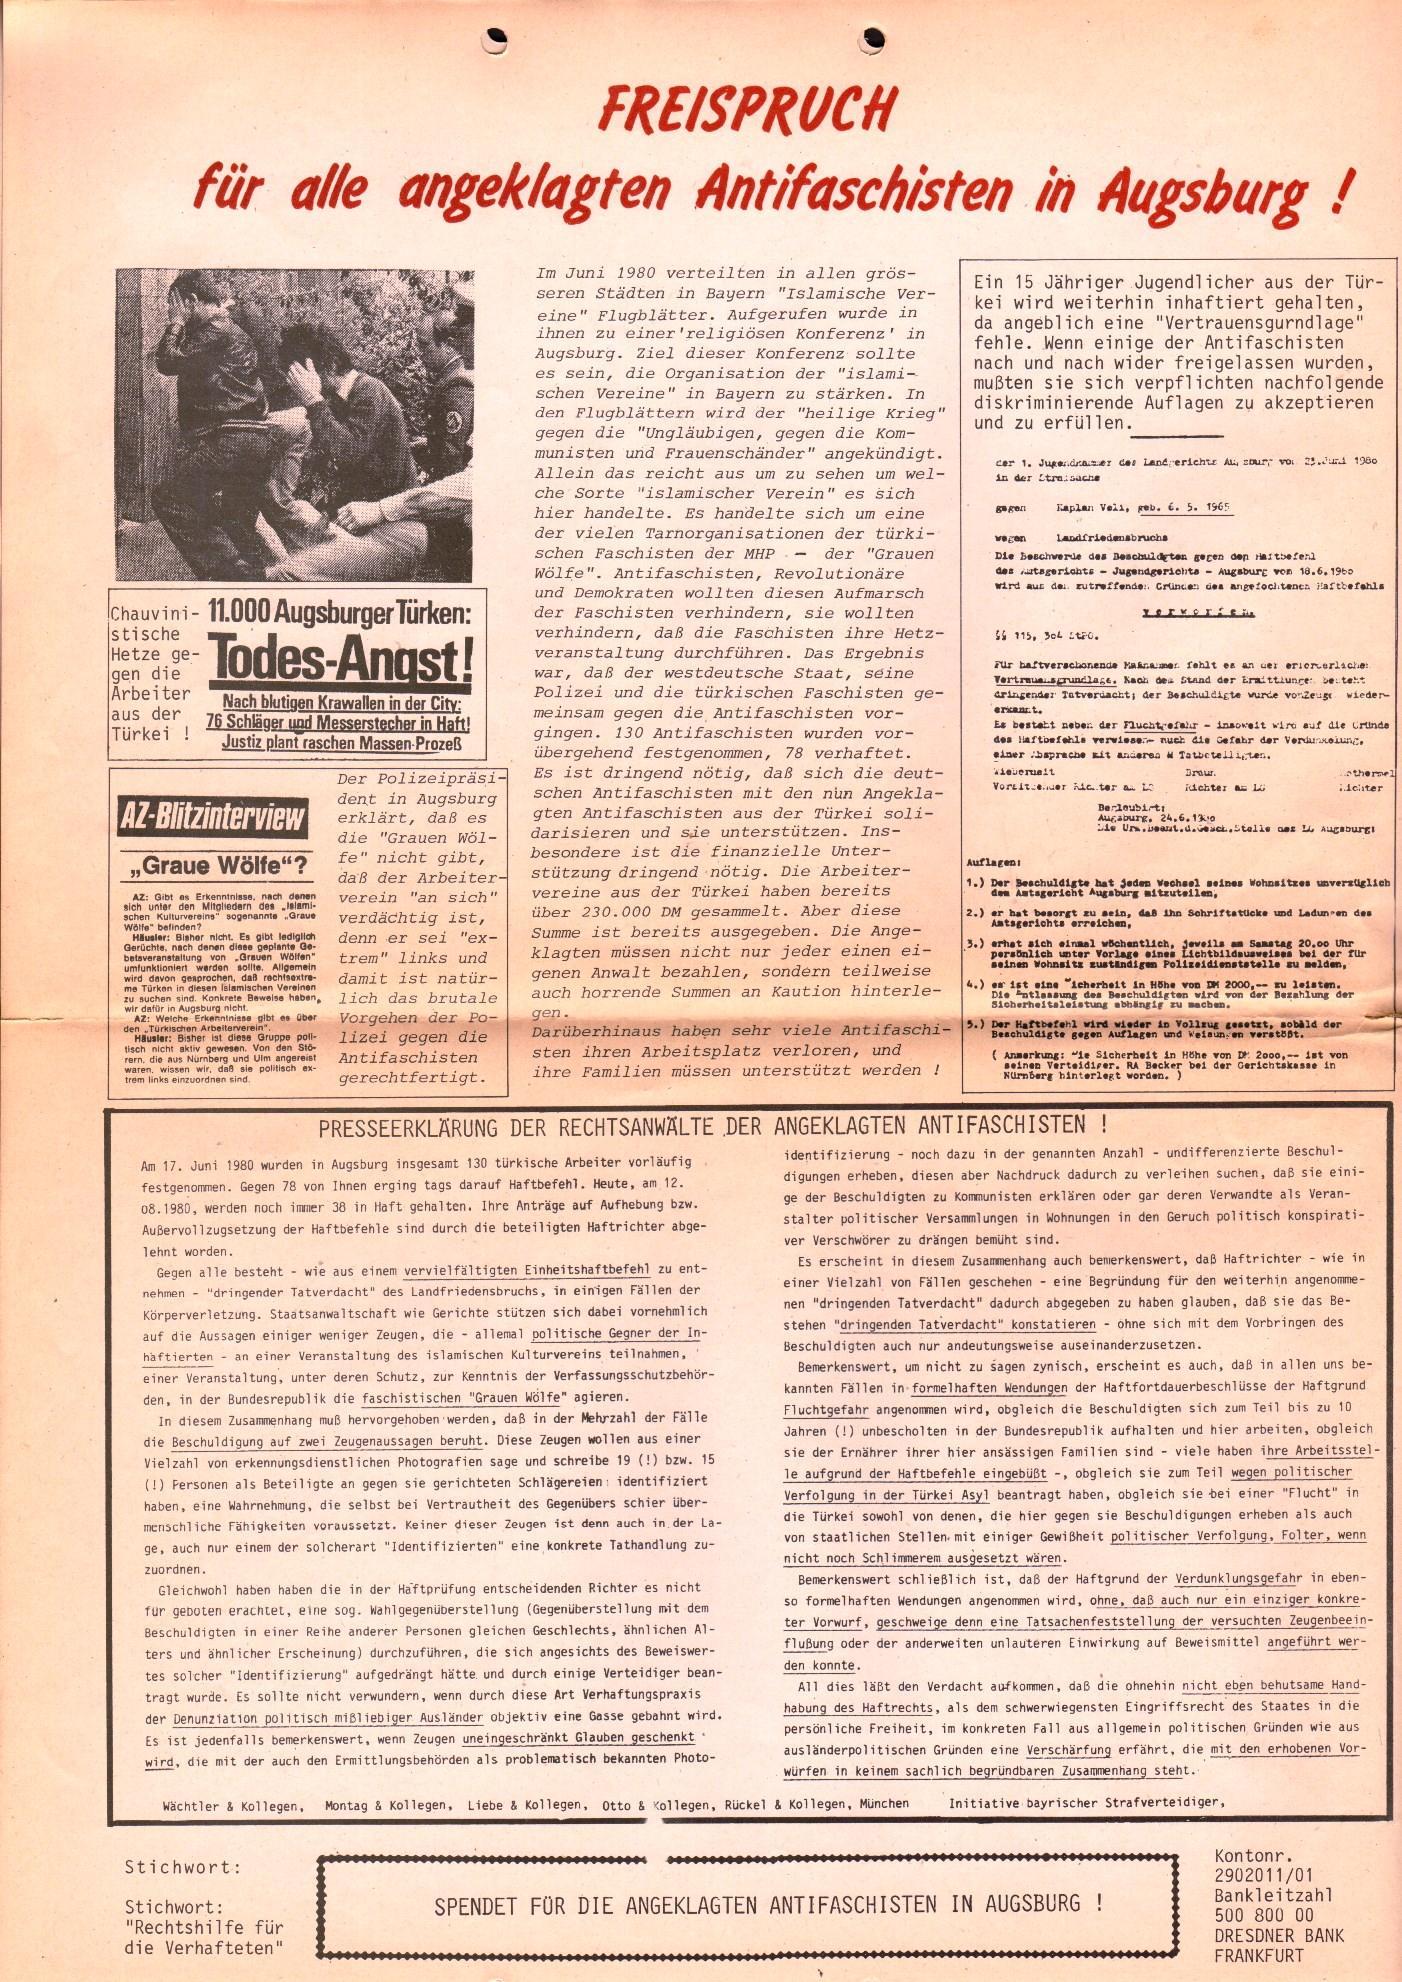 Tuerkei_im_Kampf_1980_02_08